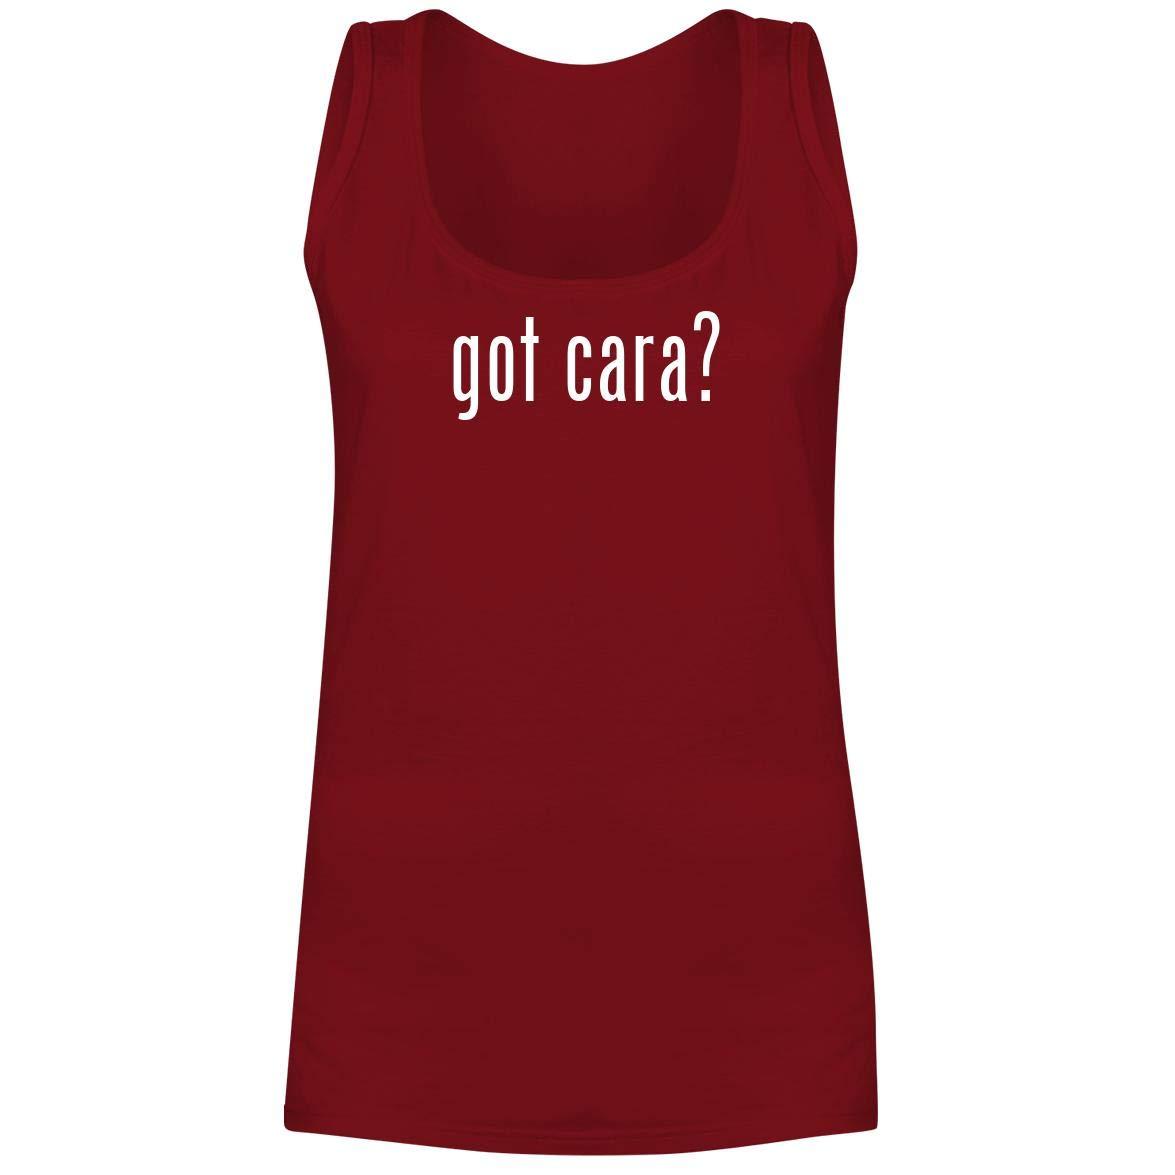 Amazon.com: got cara? - A Soft & Comfortable Womens Tank ...